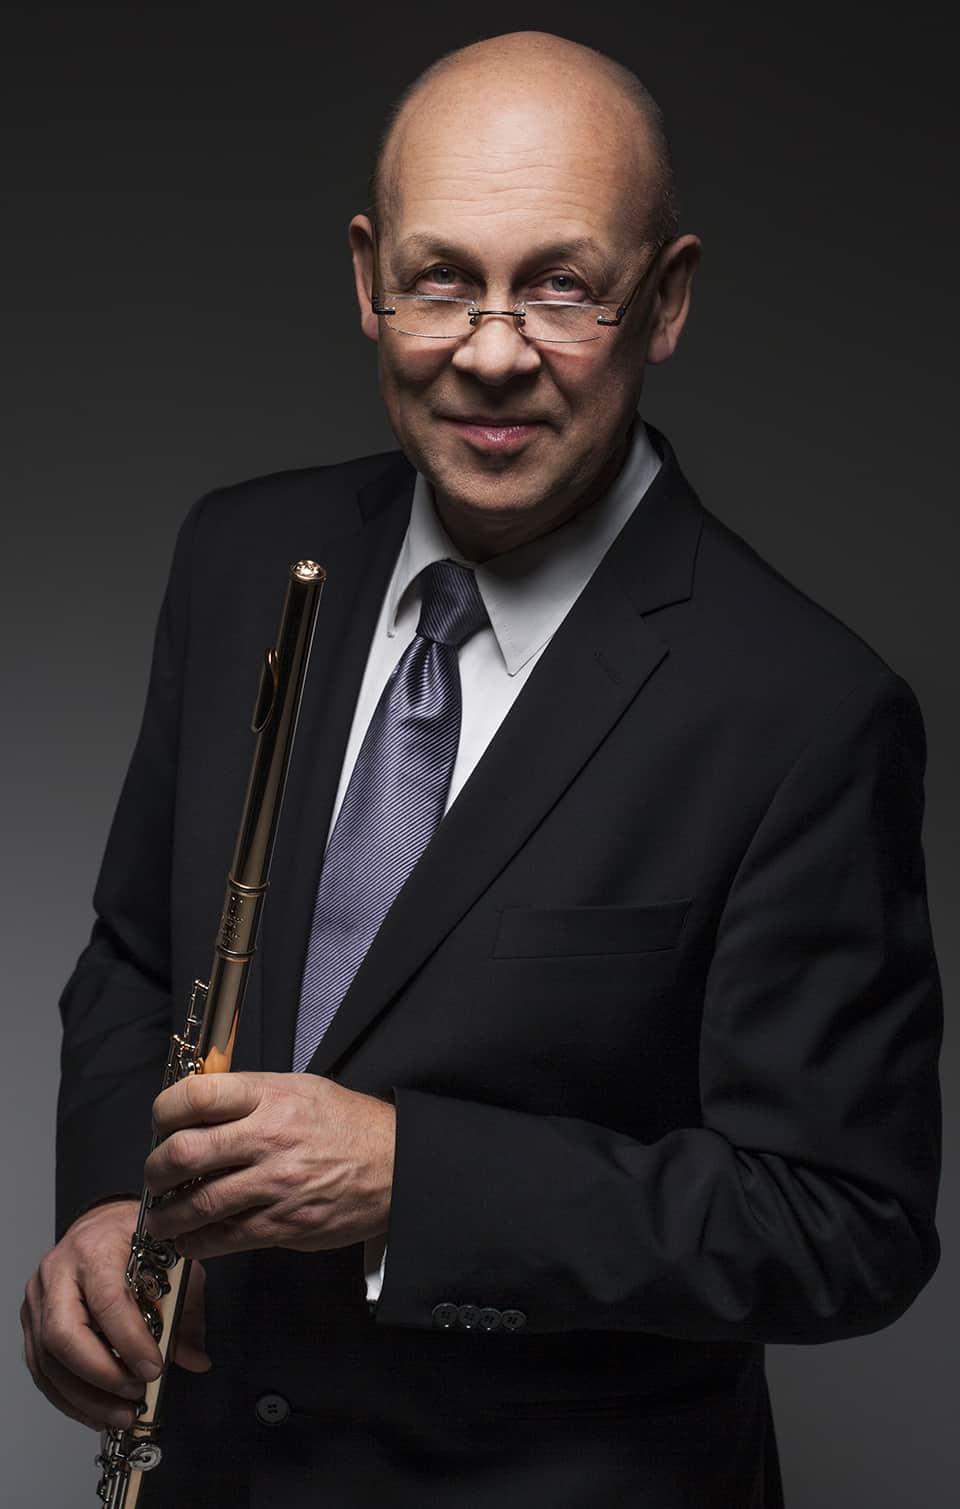 Göran Marcusson